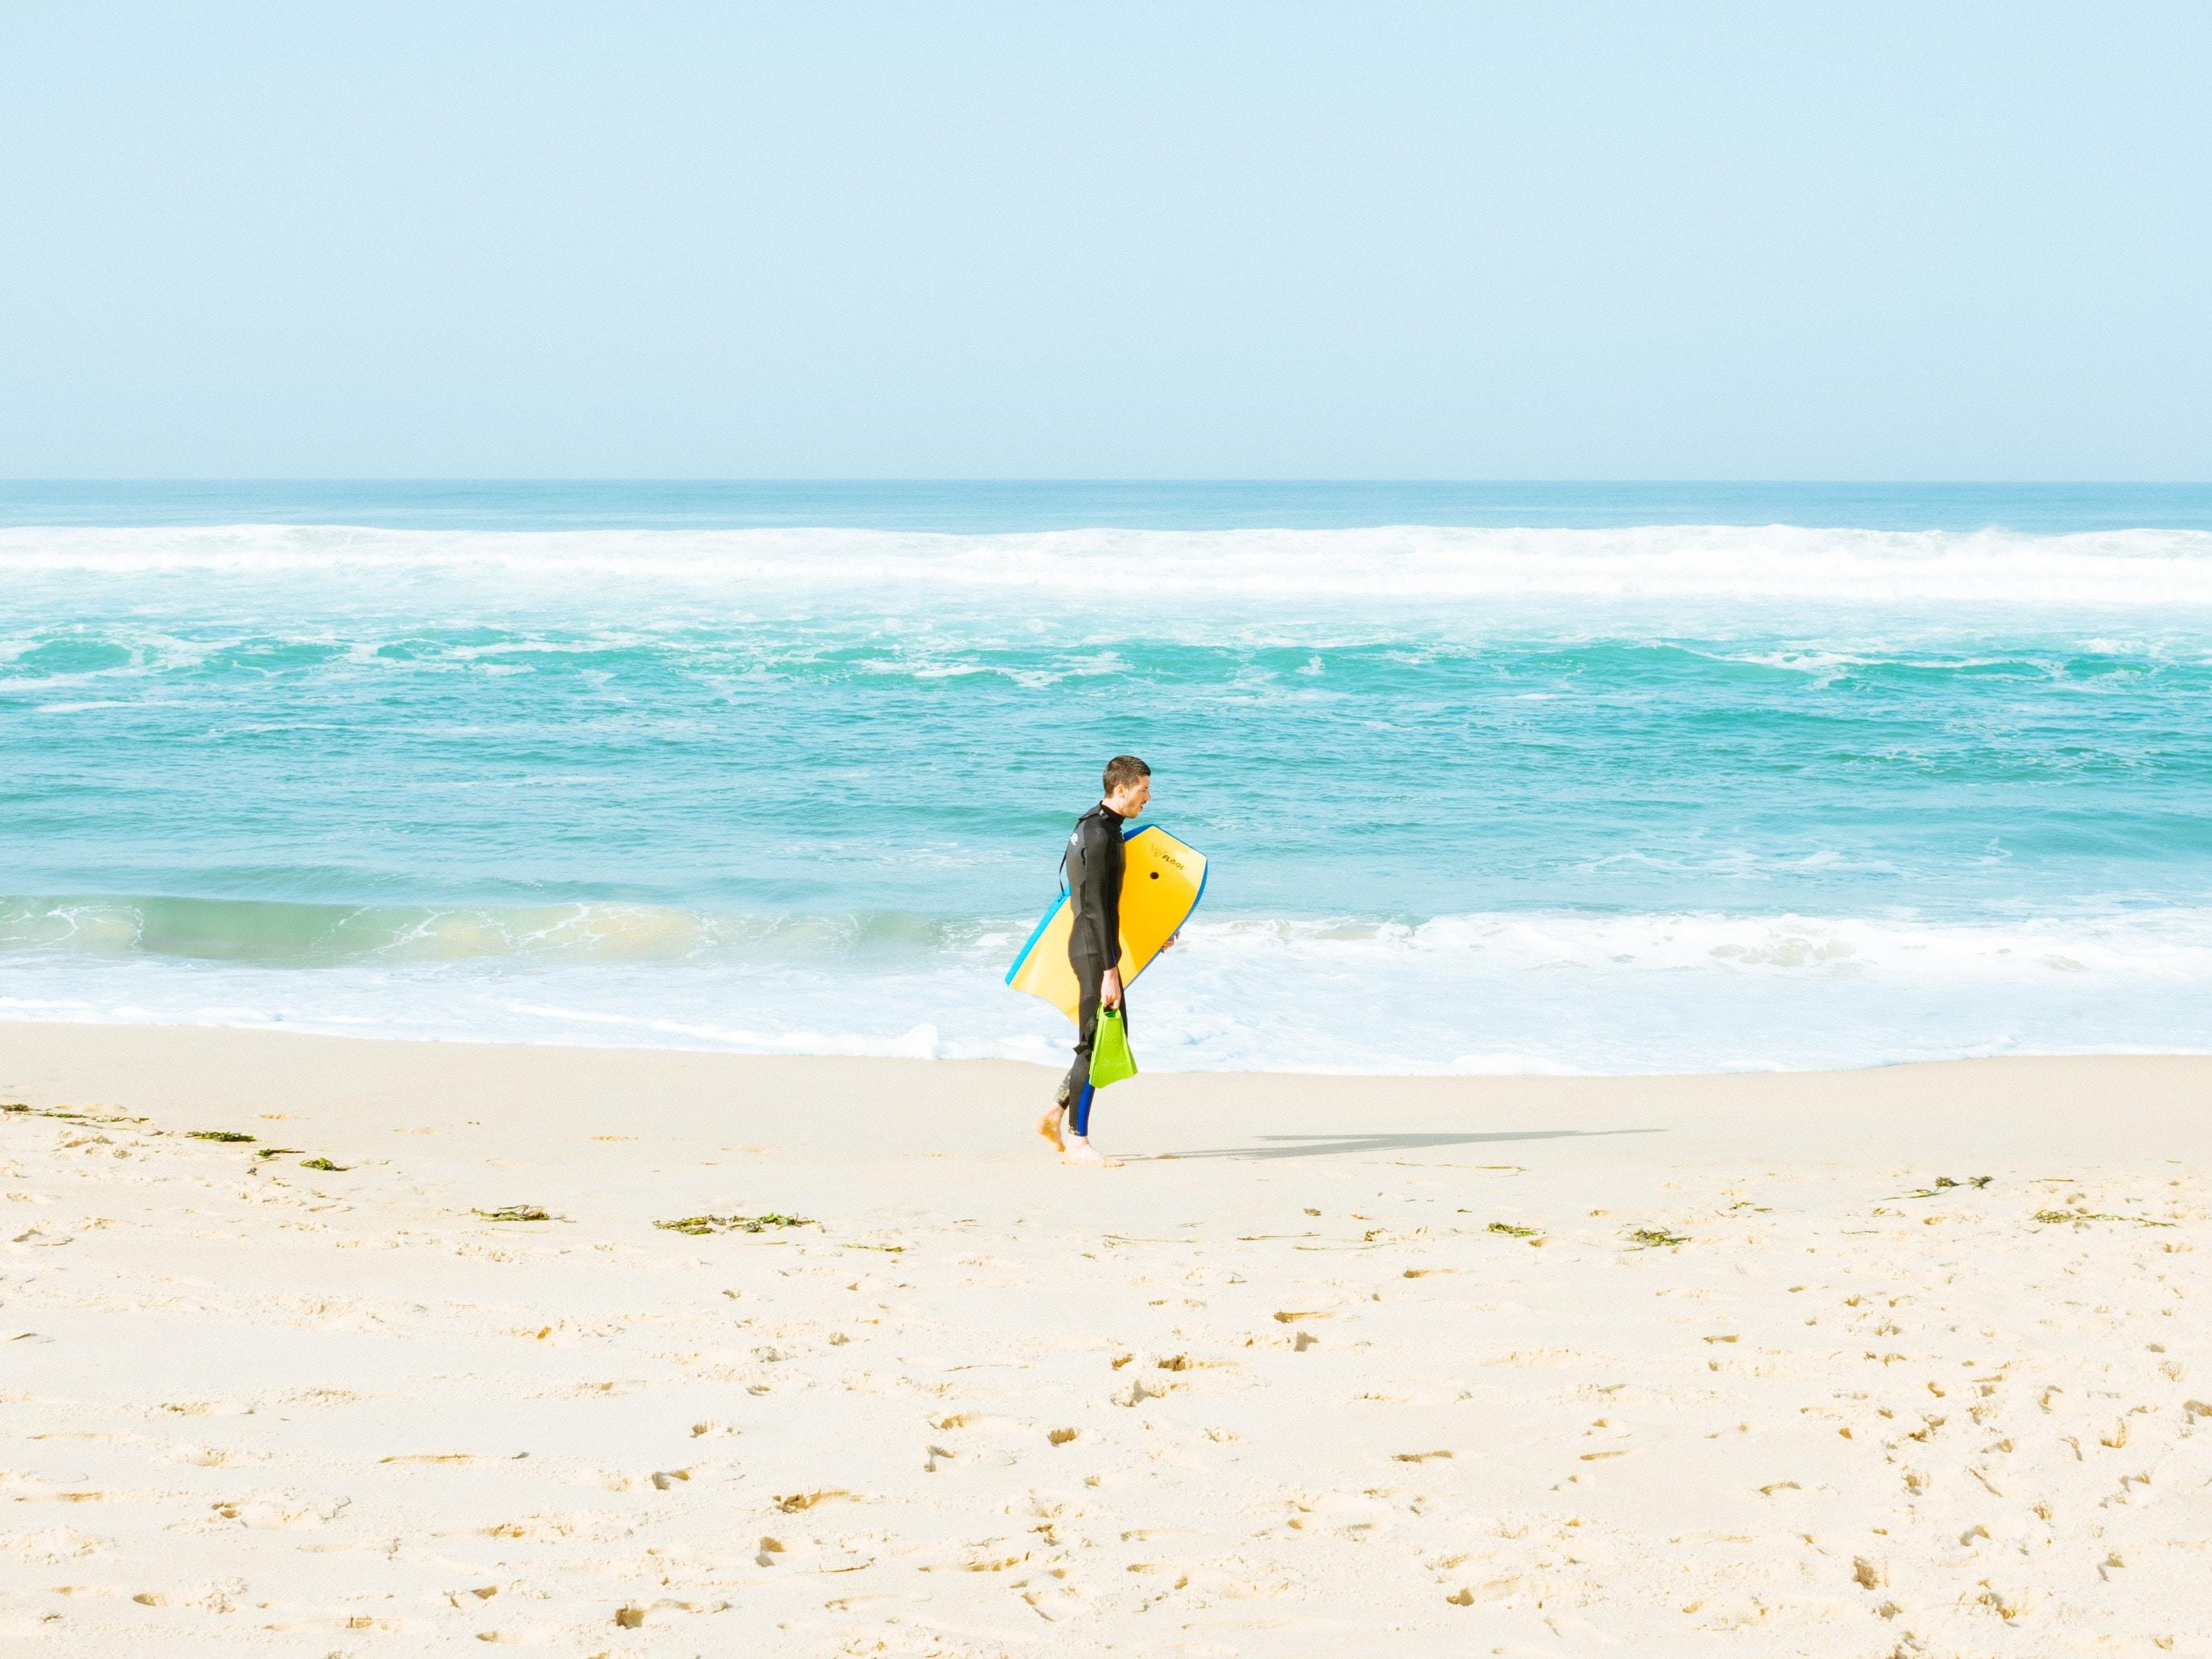 man walking on seashore holding yellow surfboard